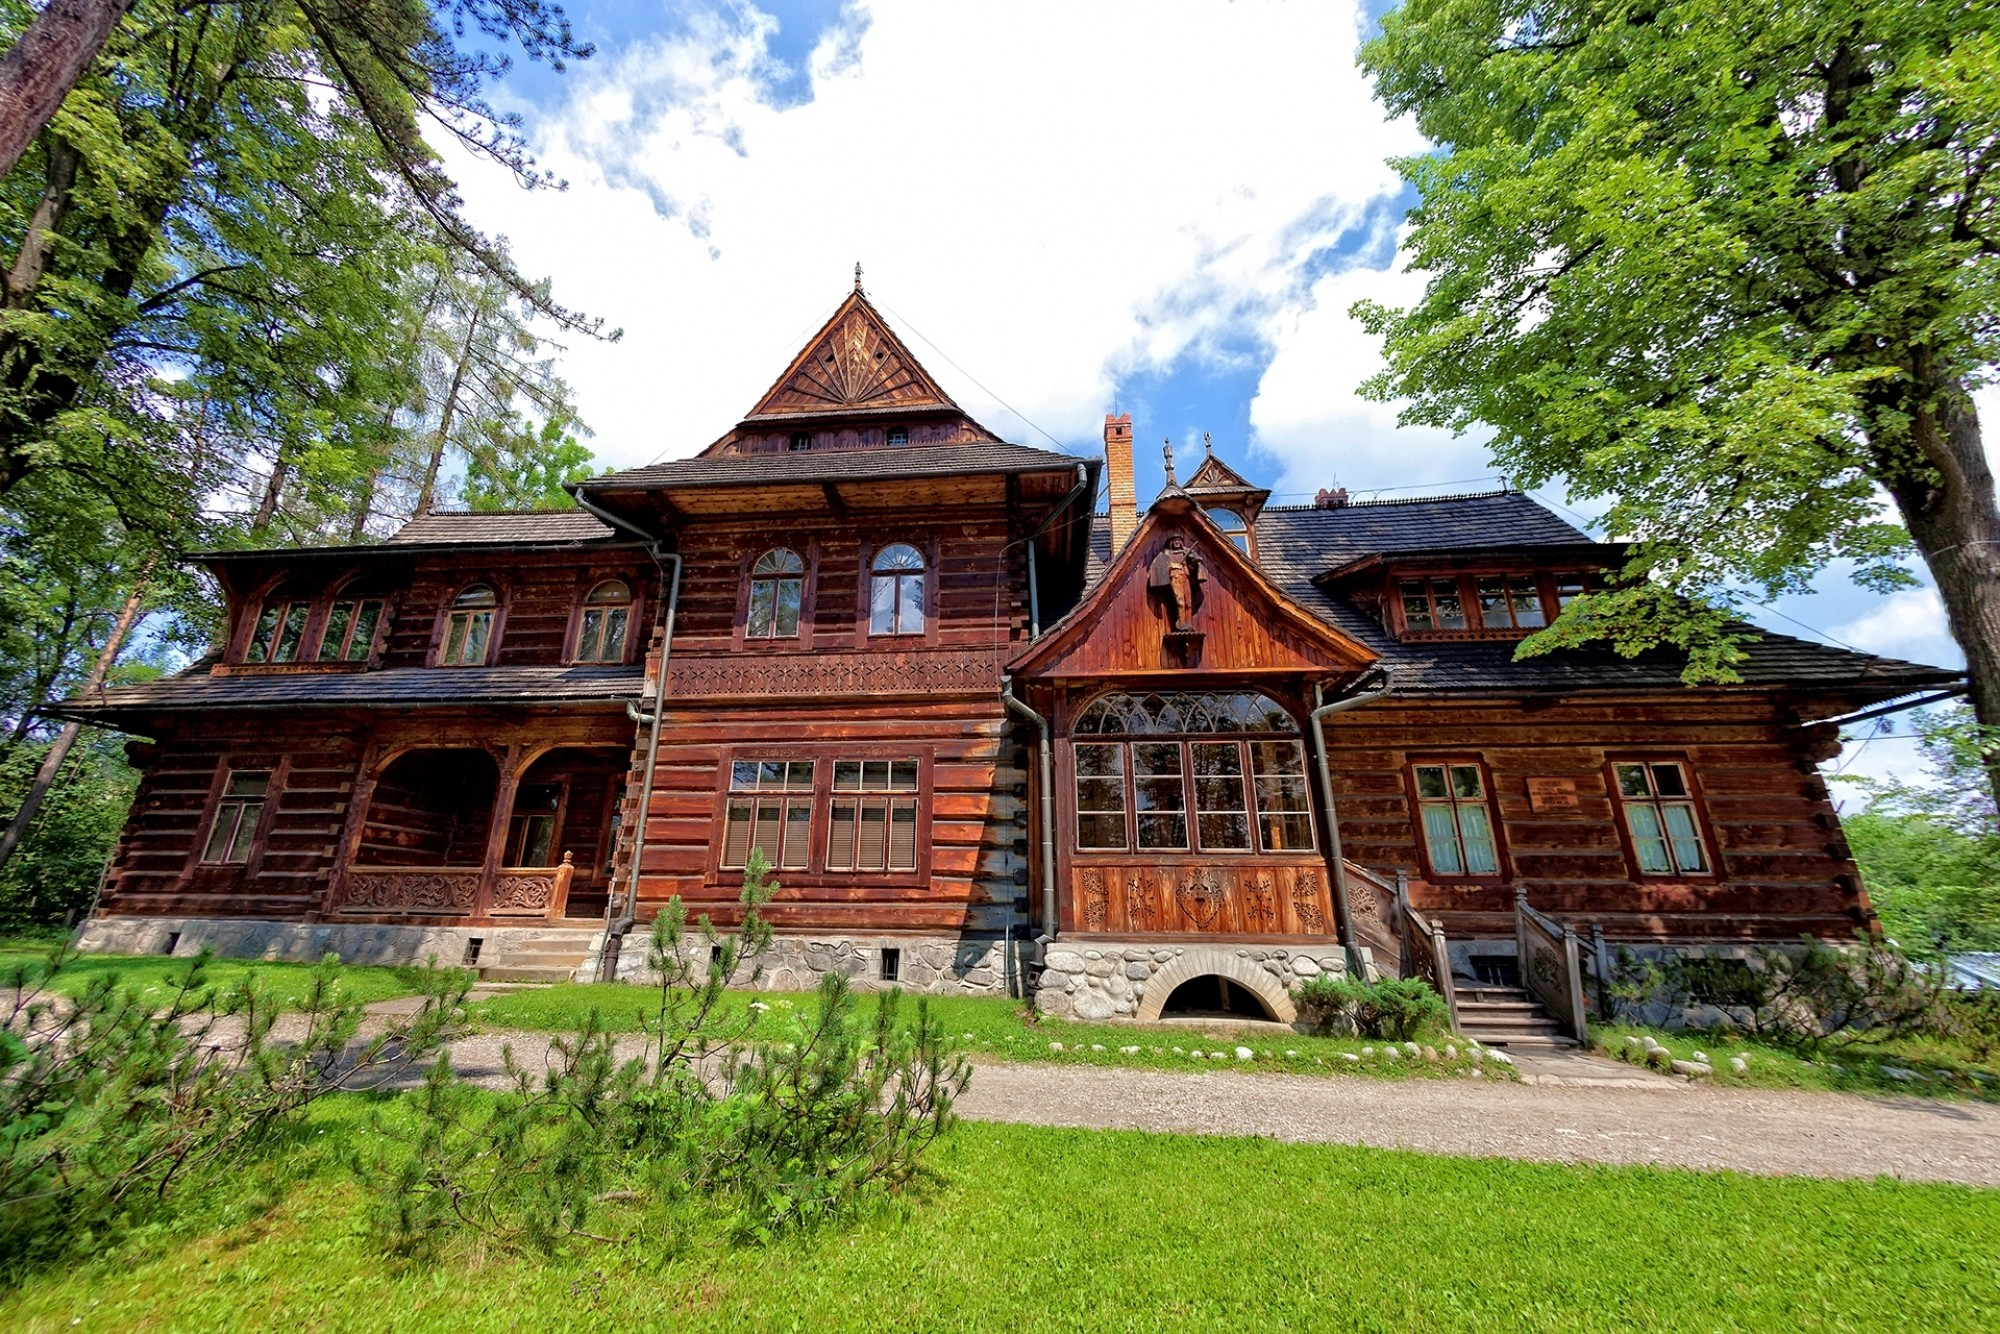 Old-house-in-the-mountain-style-in-Zakopane-Poland-shutterstock